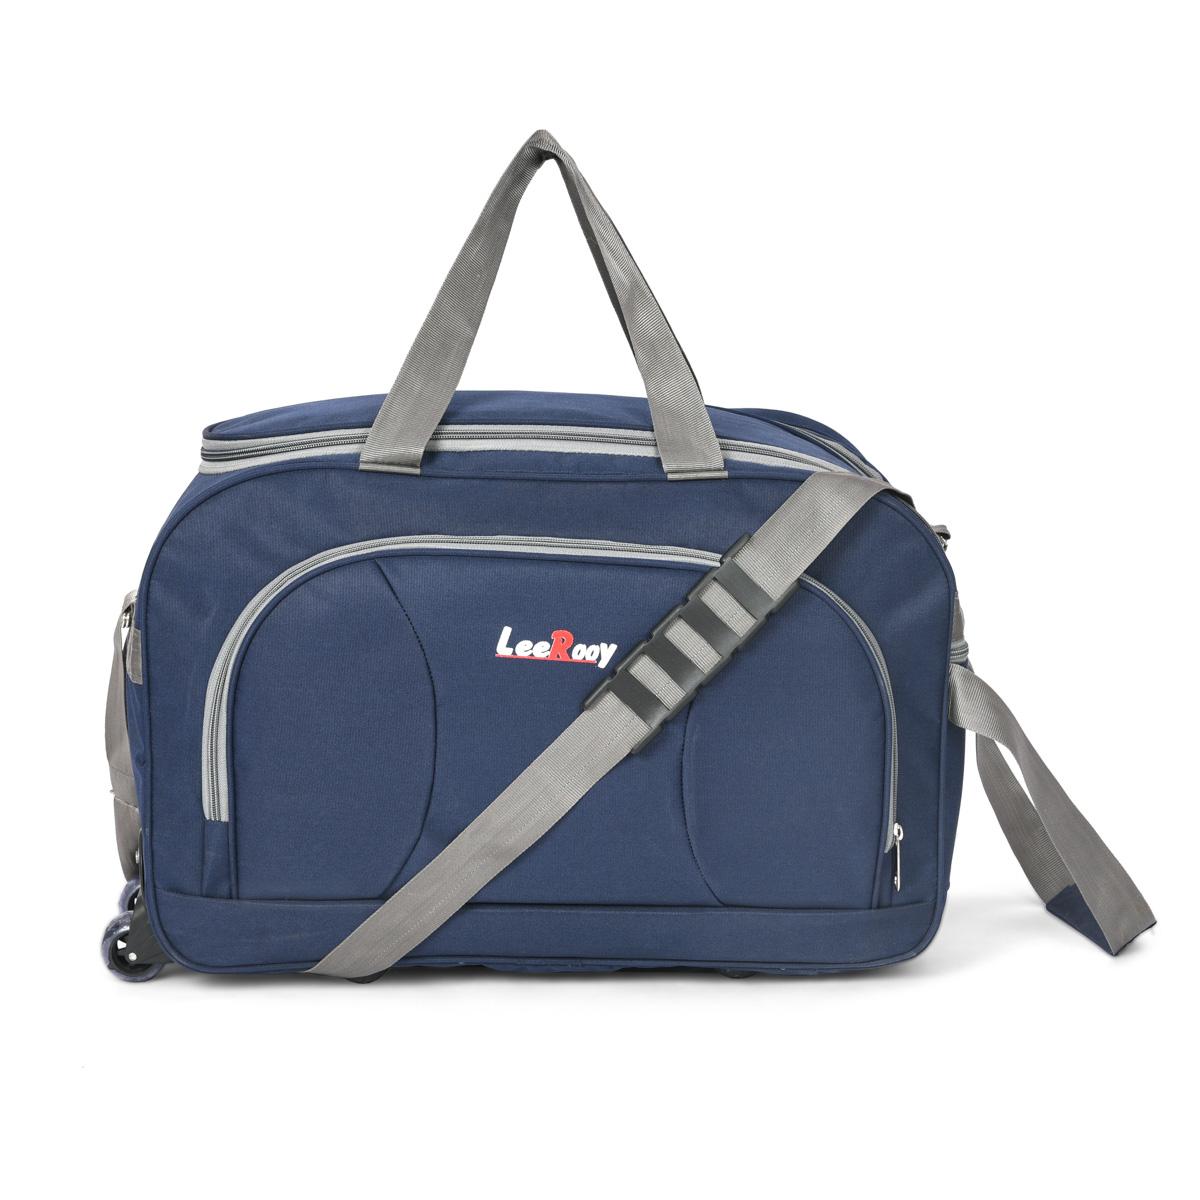 Leerooy  Expandable  Dt Bag 3 Blue Vg8 Travel Duffel Bag  Blue